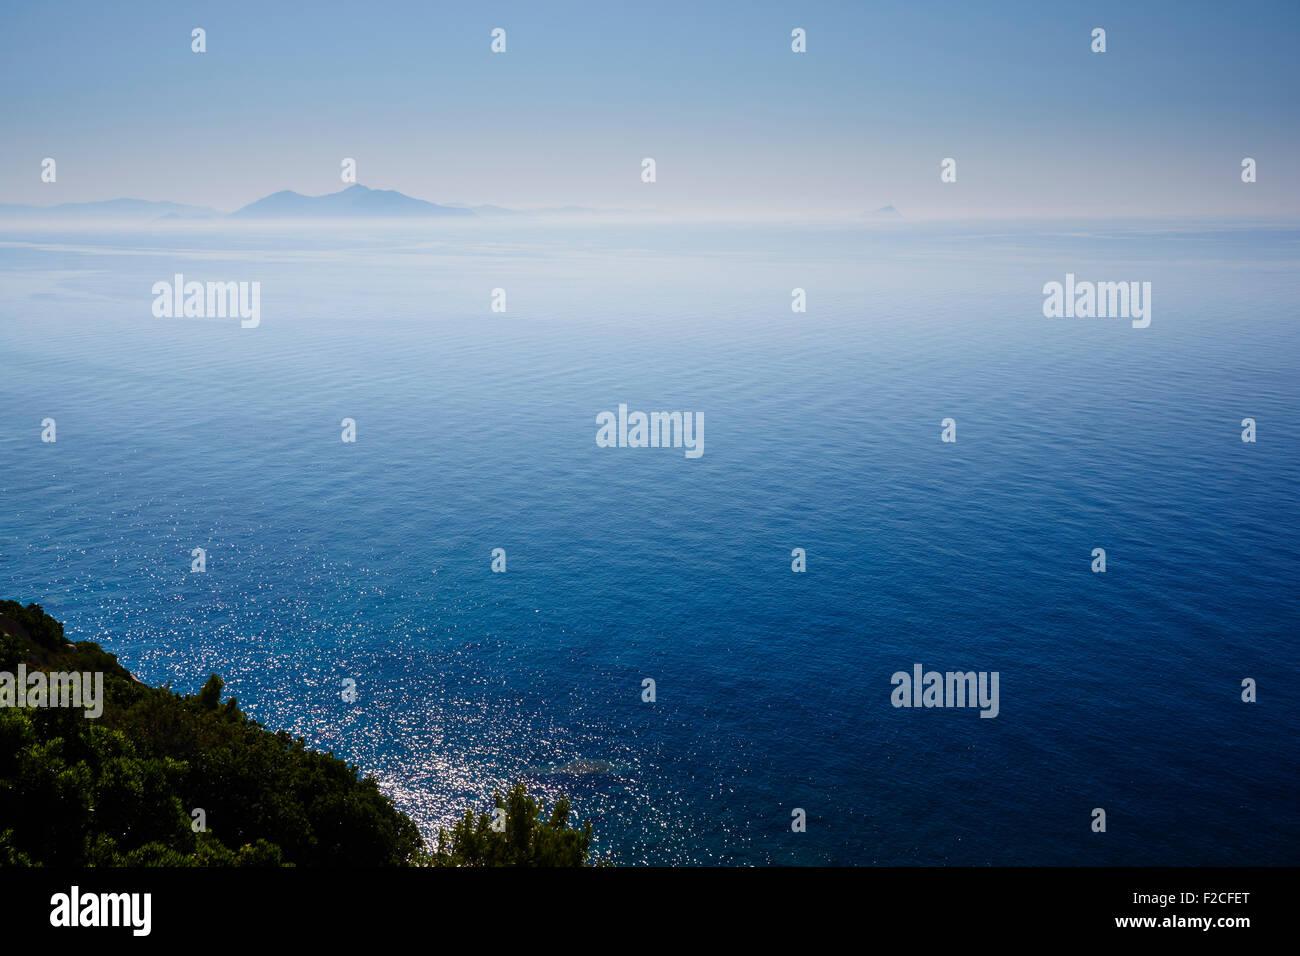 Aegean Sea, Greece, showing Fourni in the distance, Ikaria in the foreground. AKA Icarian Sea - Stock Image